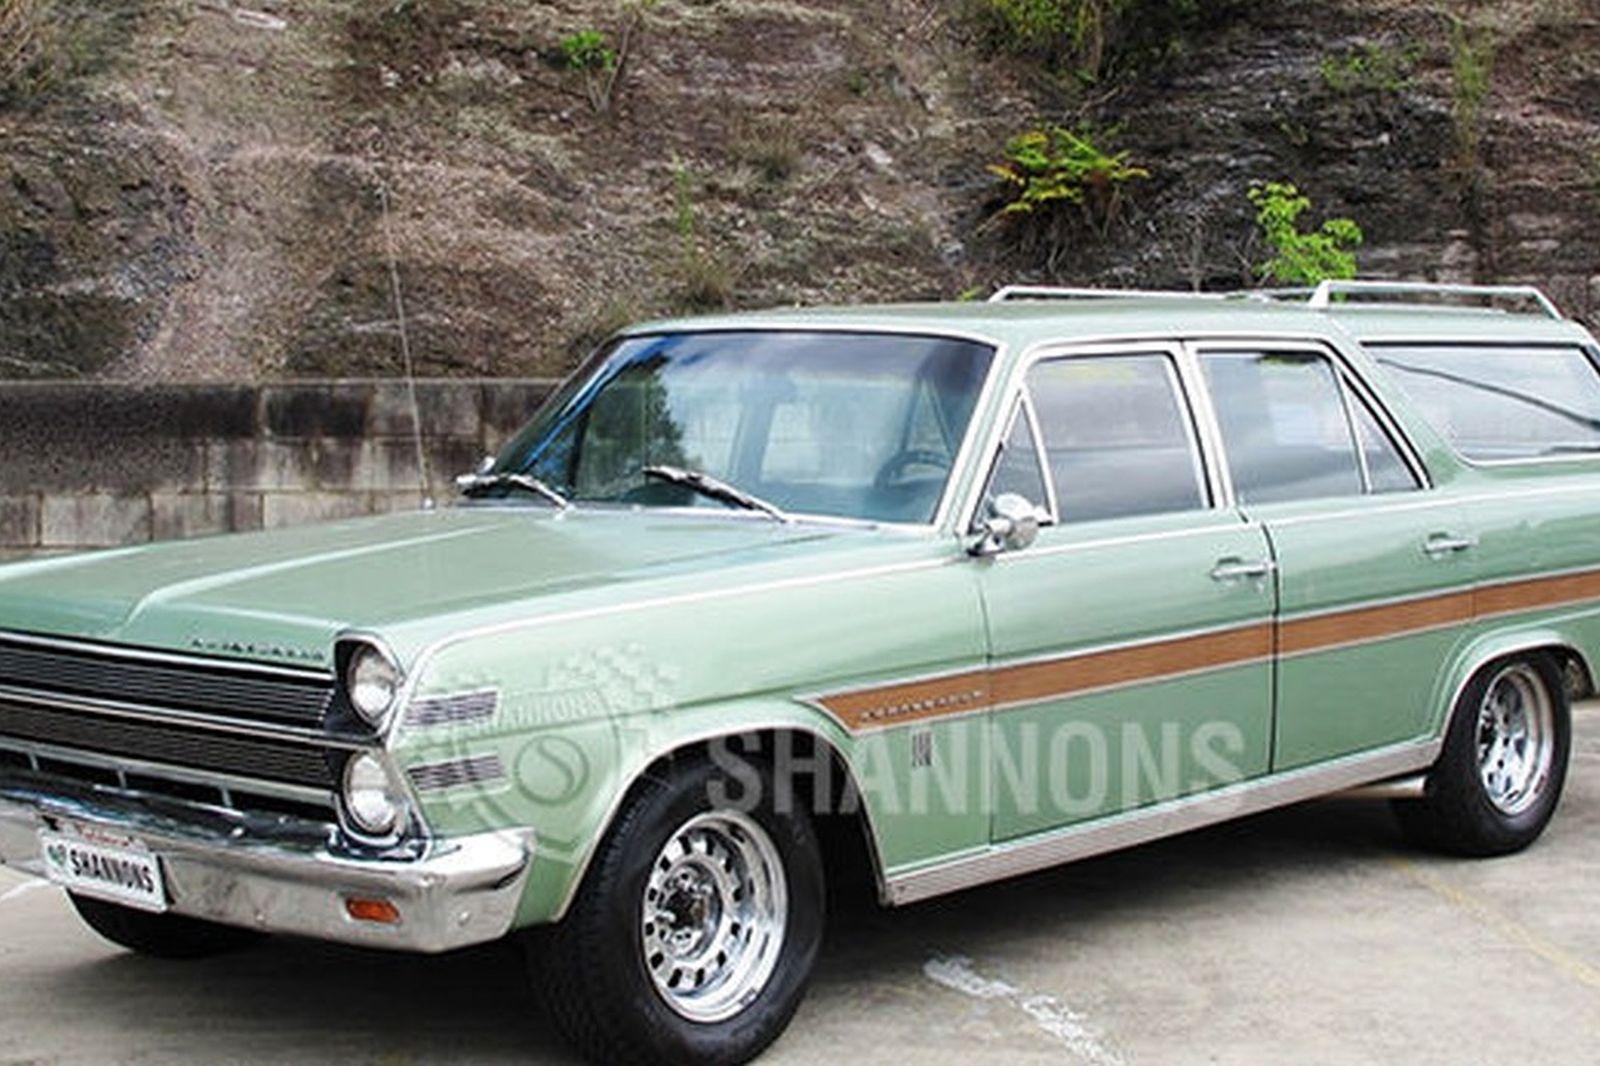 AMC Ambassador 990 Cross Country Wagon (LHD) Auctions - Lot 15 ...